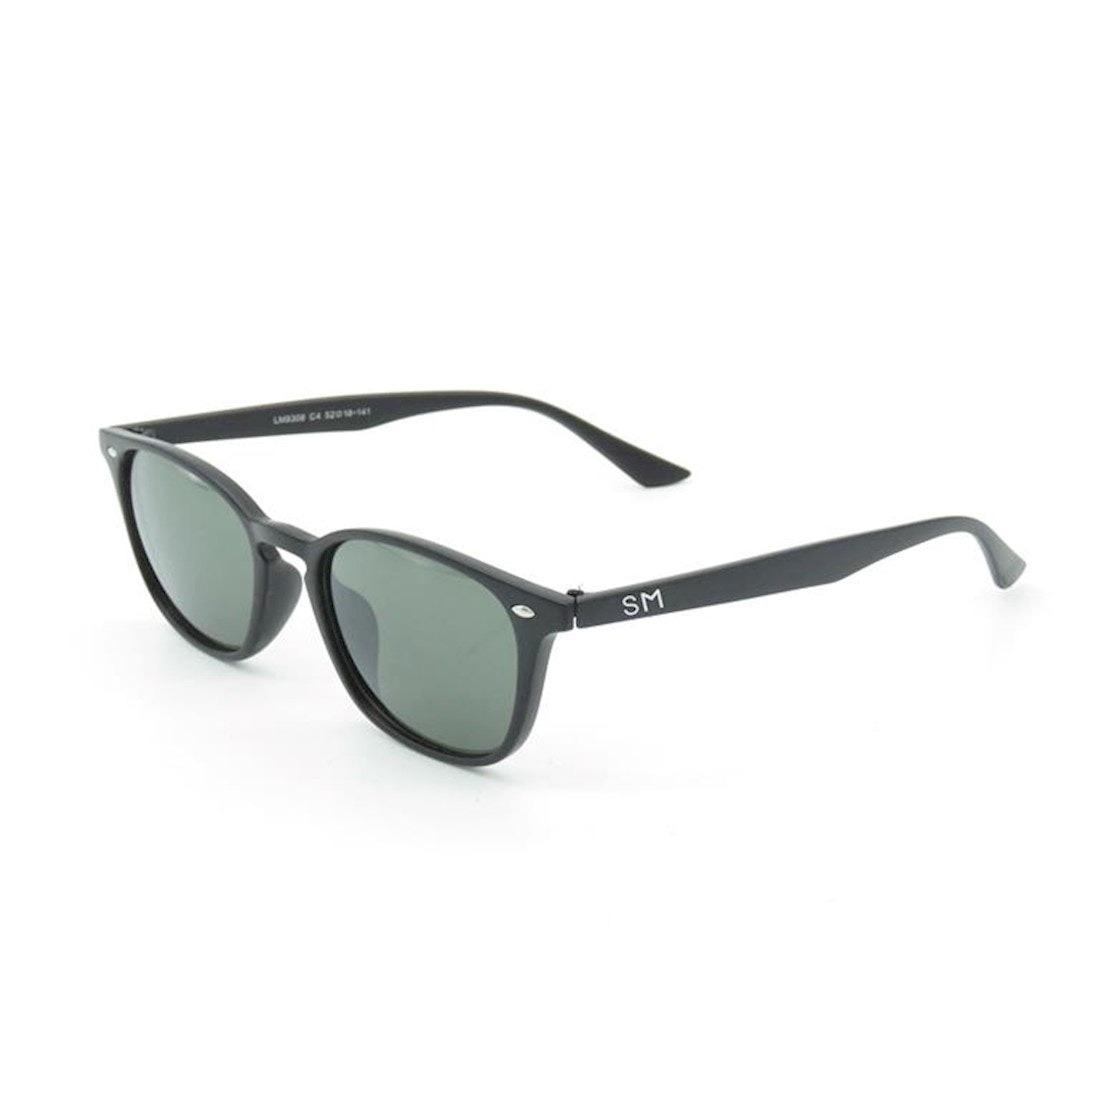 41f7fafd9f5c9 Óculos De Sol Masculino Sandro Moscoloni Ferraz Preto - R  156,89 em ...